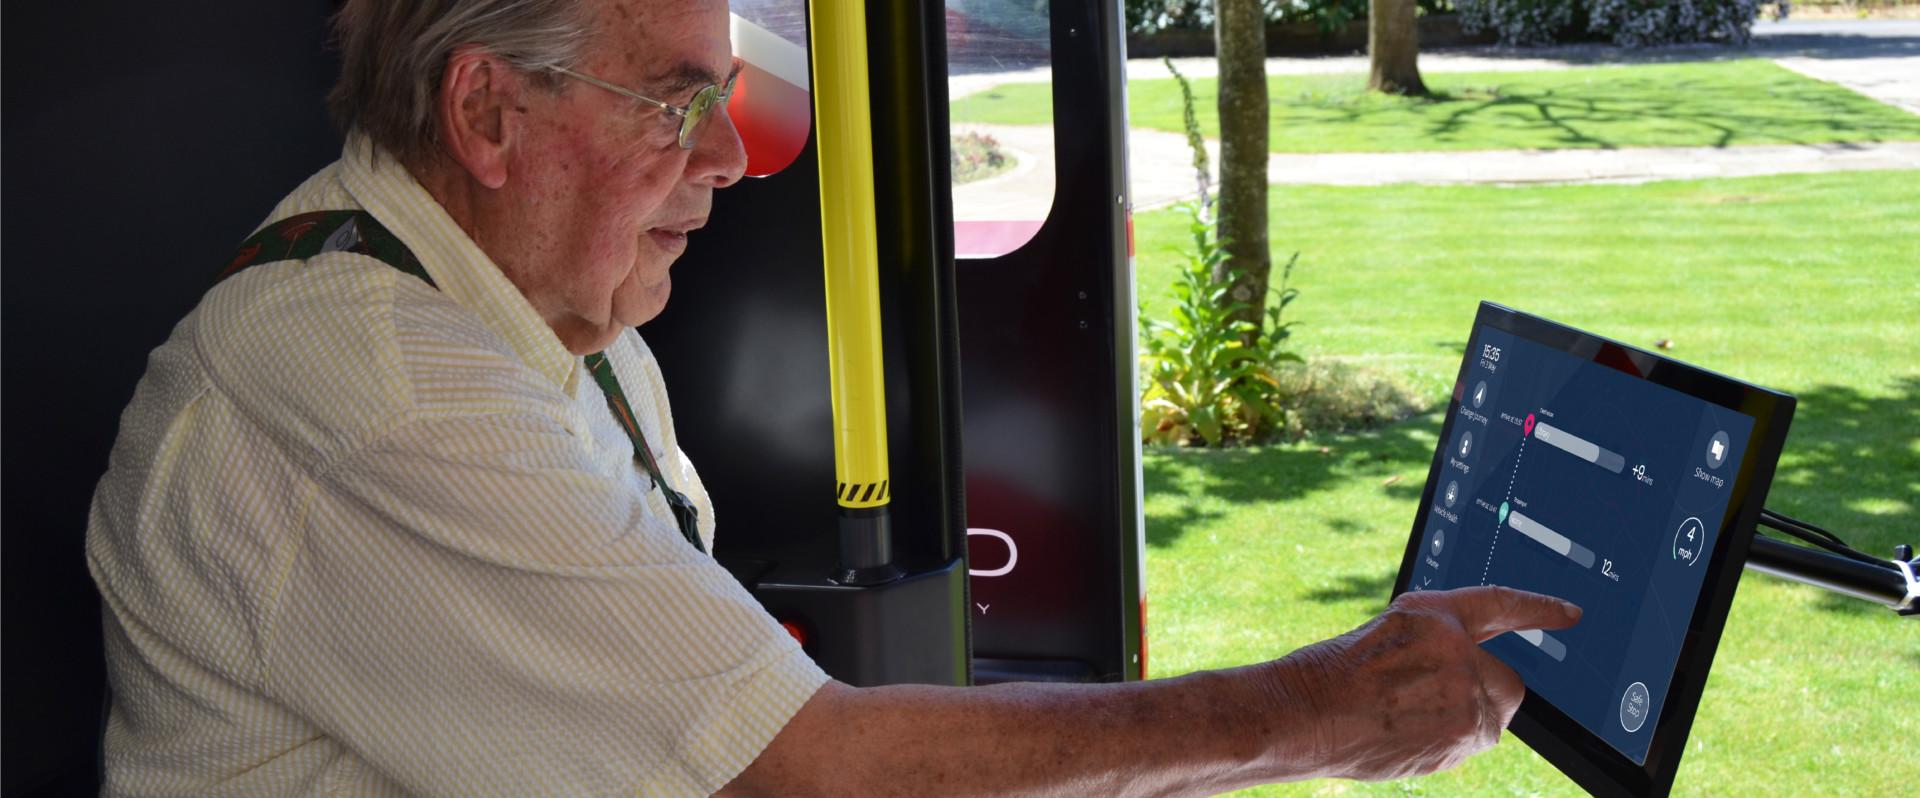 Older man using human machine interace in a driverless car